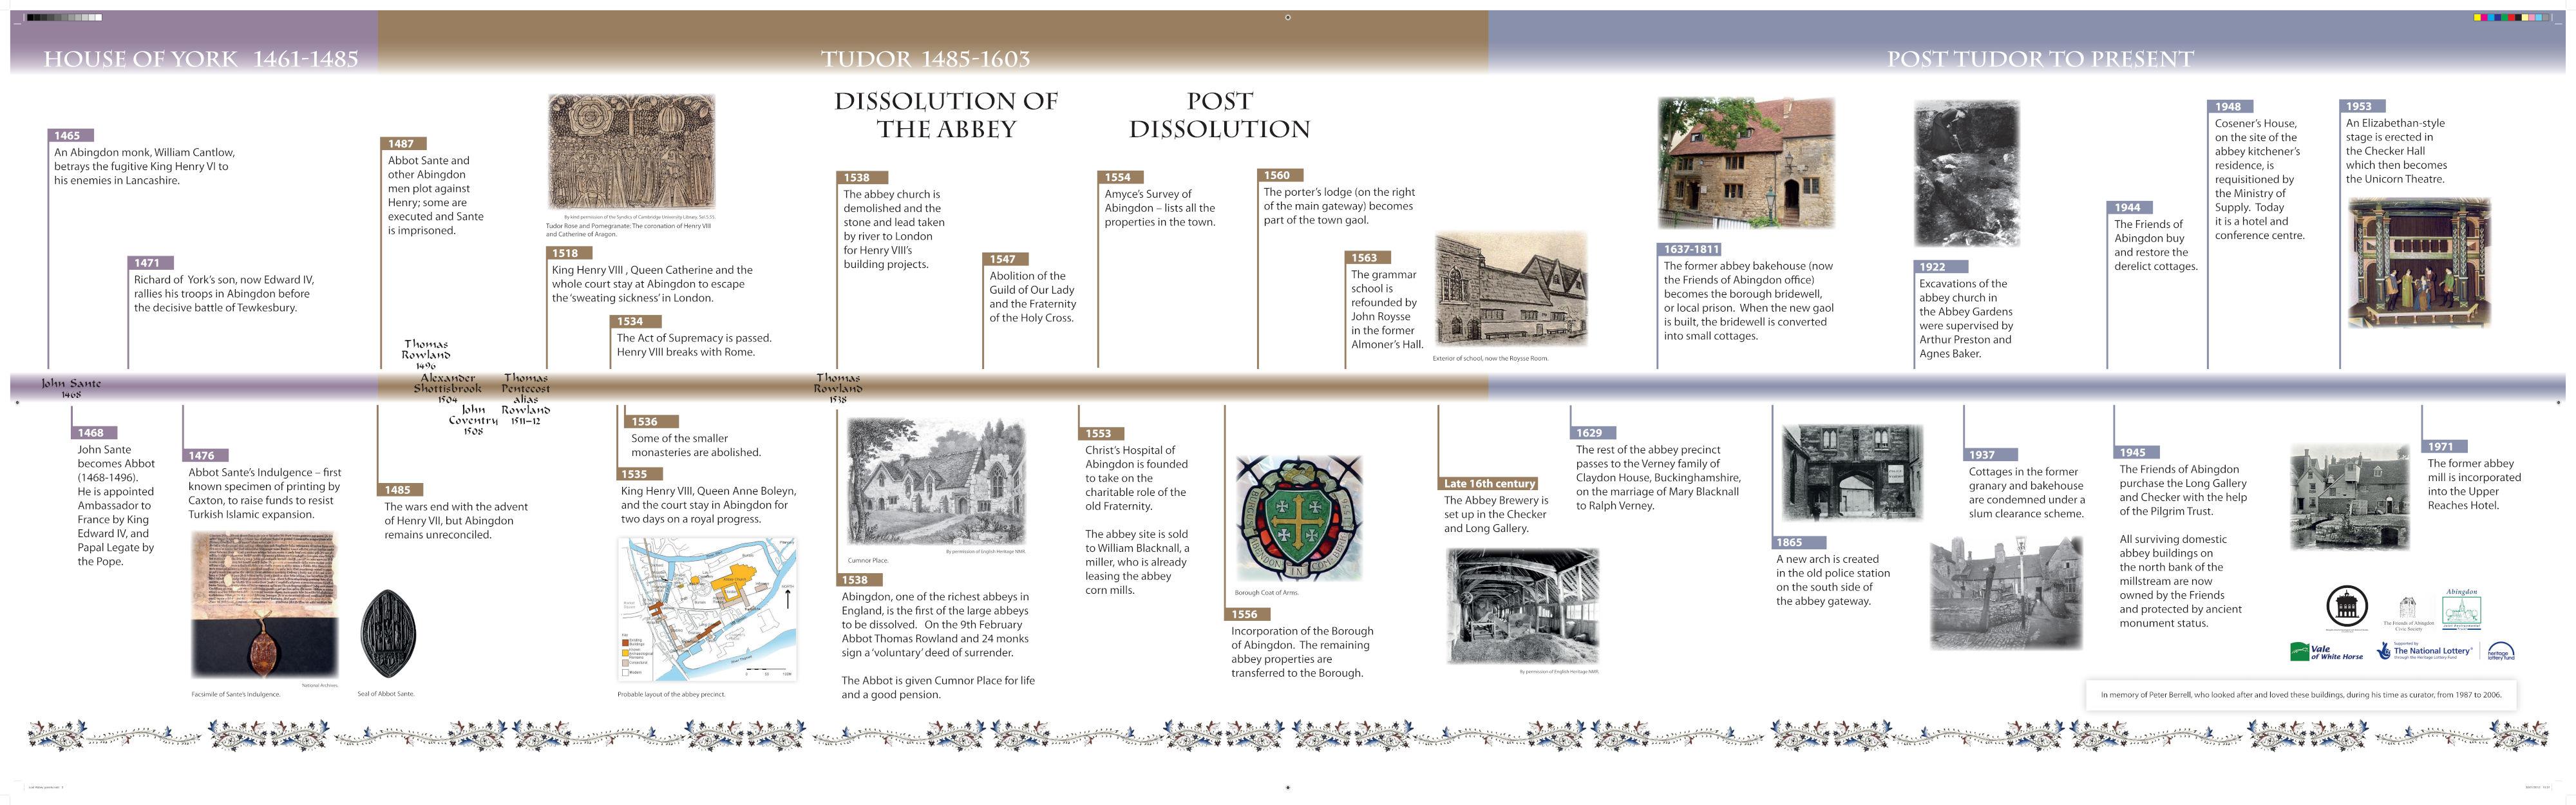 Abingdon Abbey Timeline 3